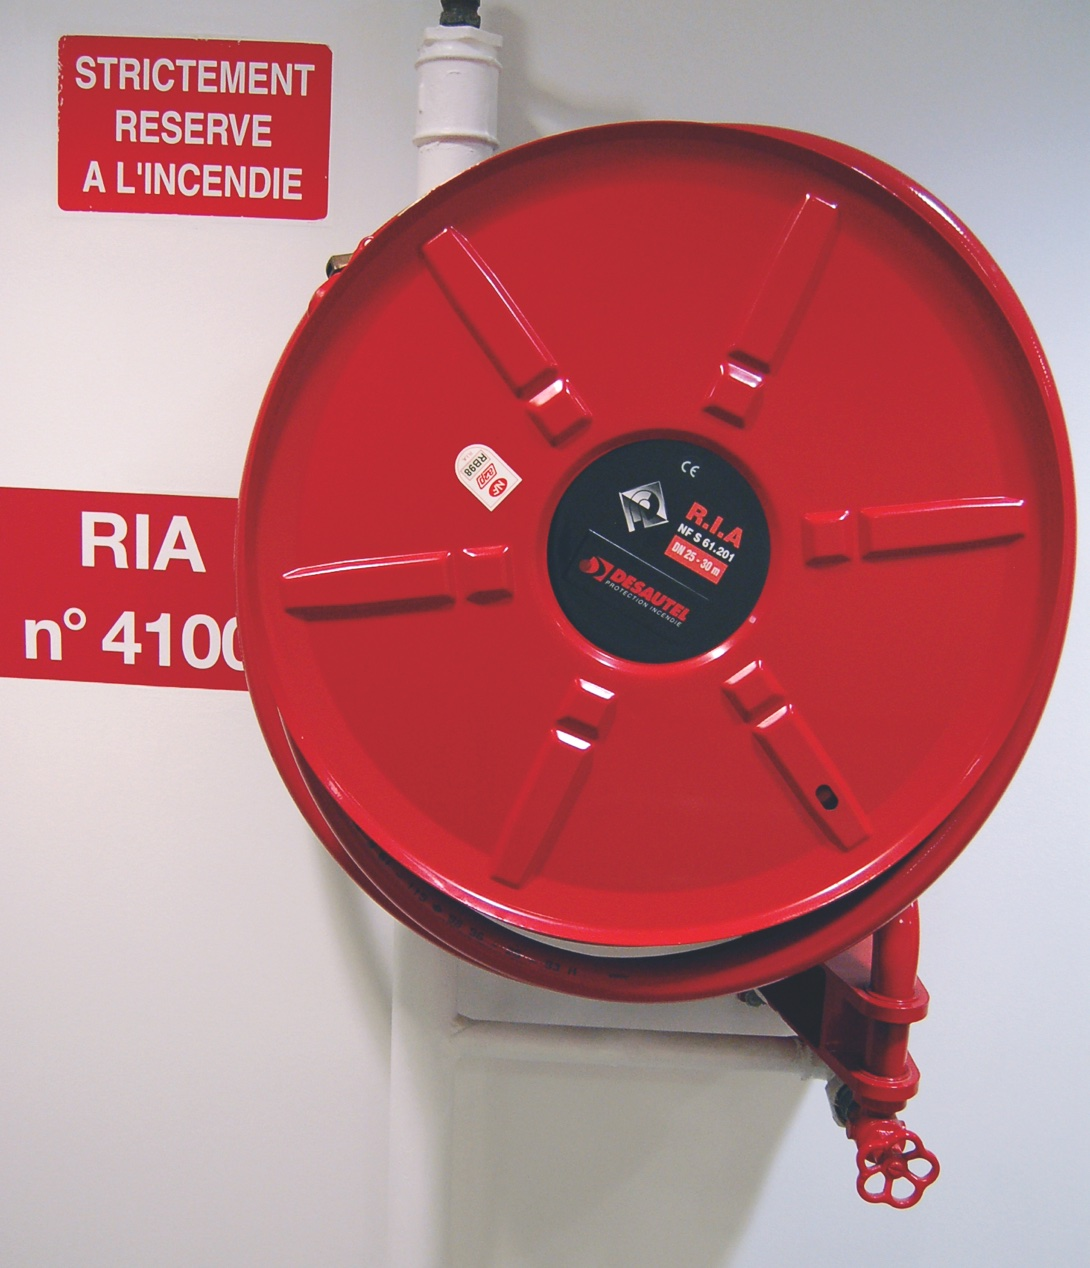 Robinet d'incendie armé (RIA)